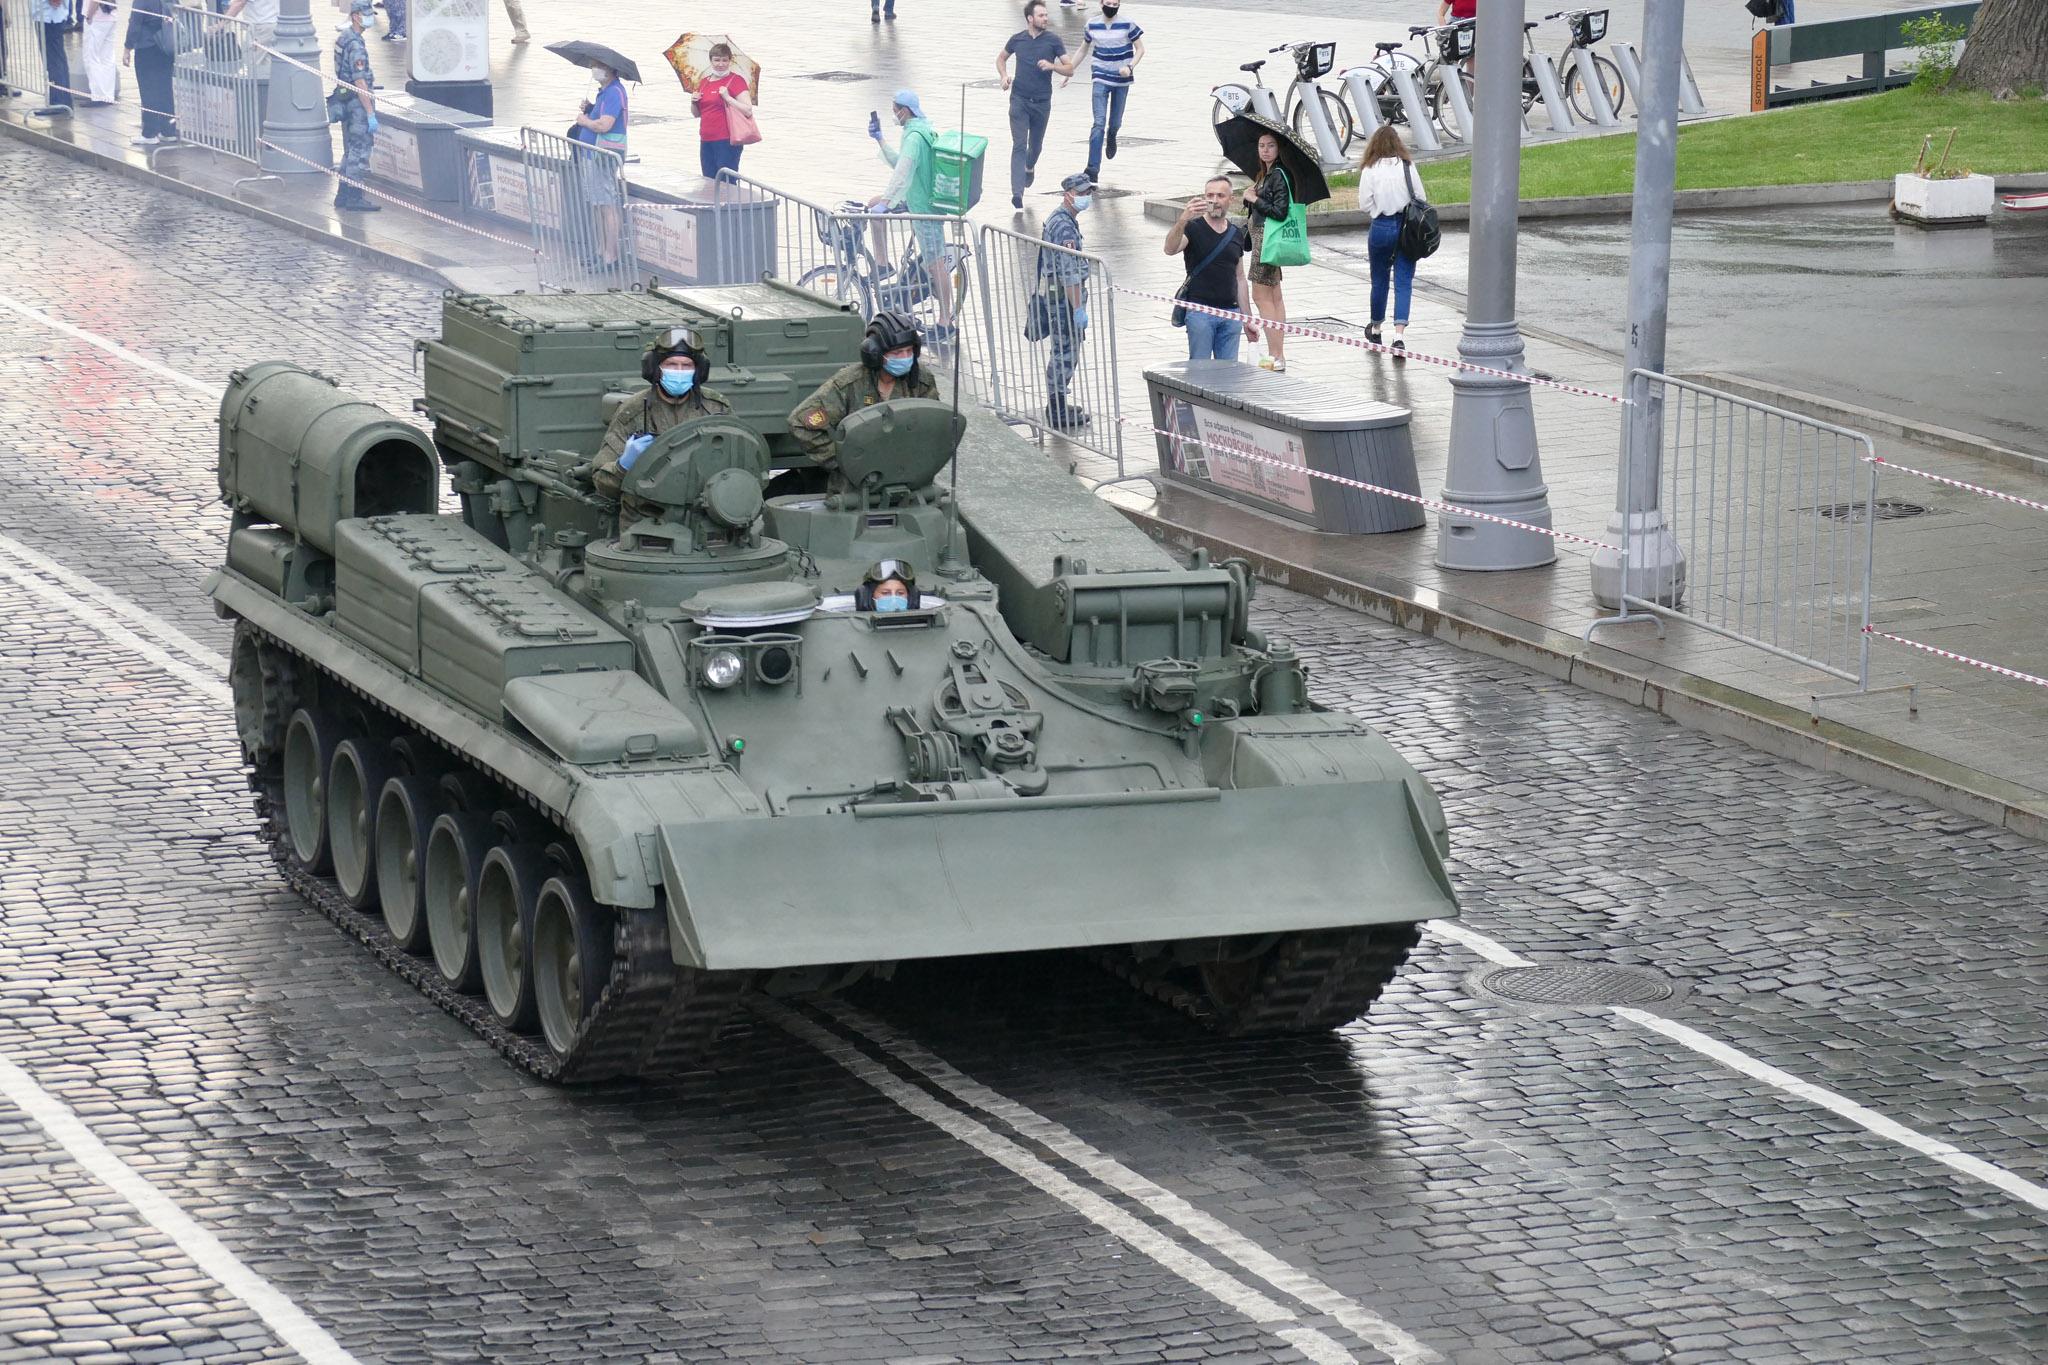 https://ic.pics.livejournal.com/yuripasholok/765139/16582883/16582883_original.jpg